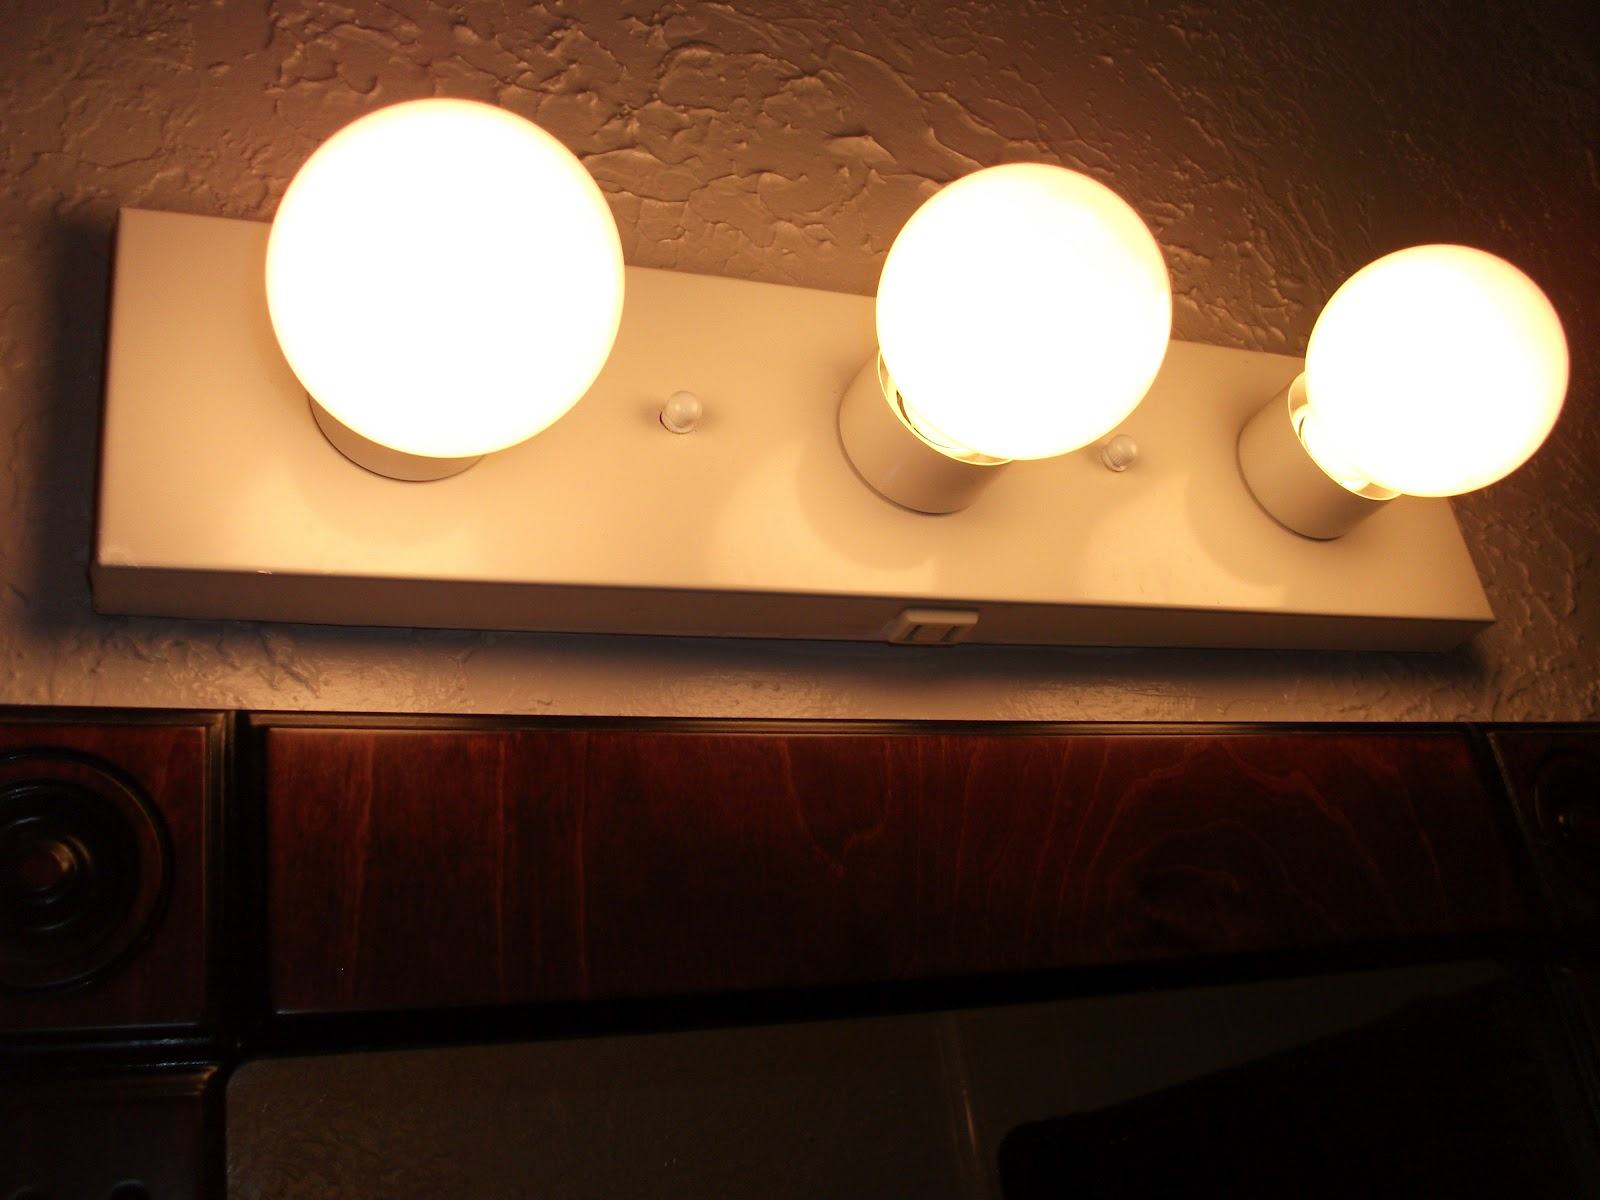 Costco bathroom lighting - Costco Bathroom Lighting